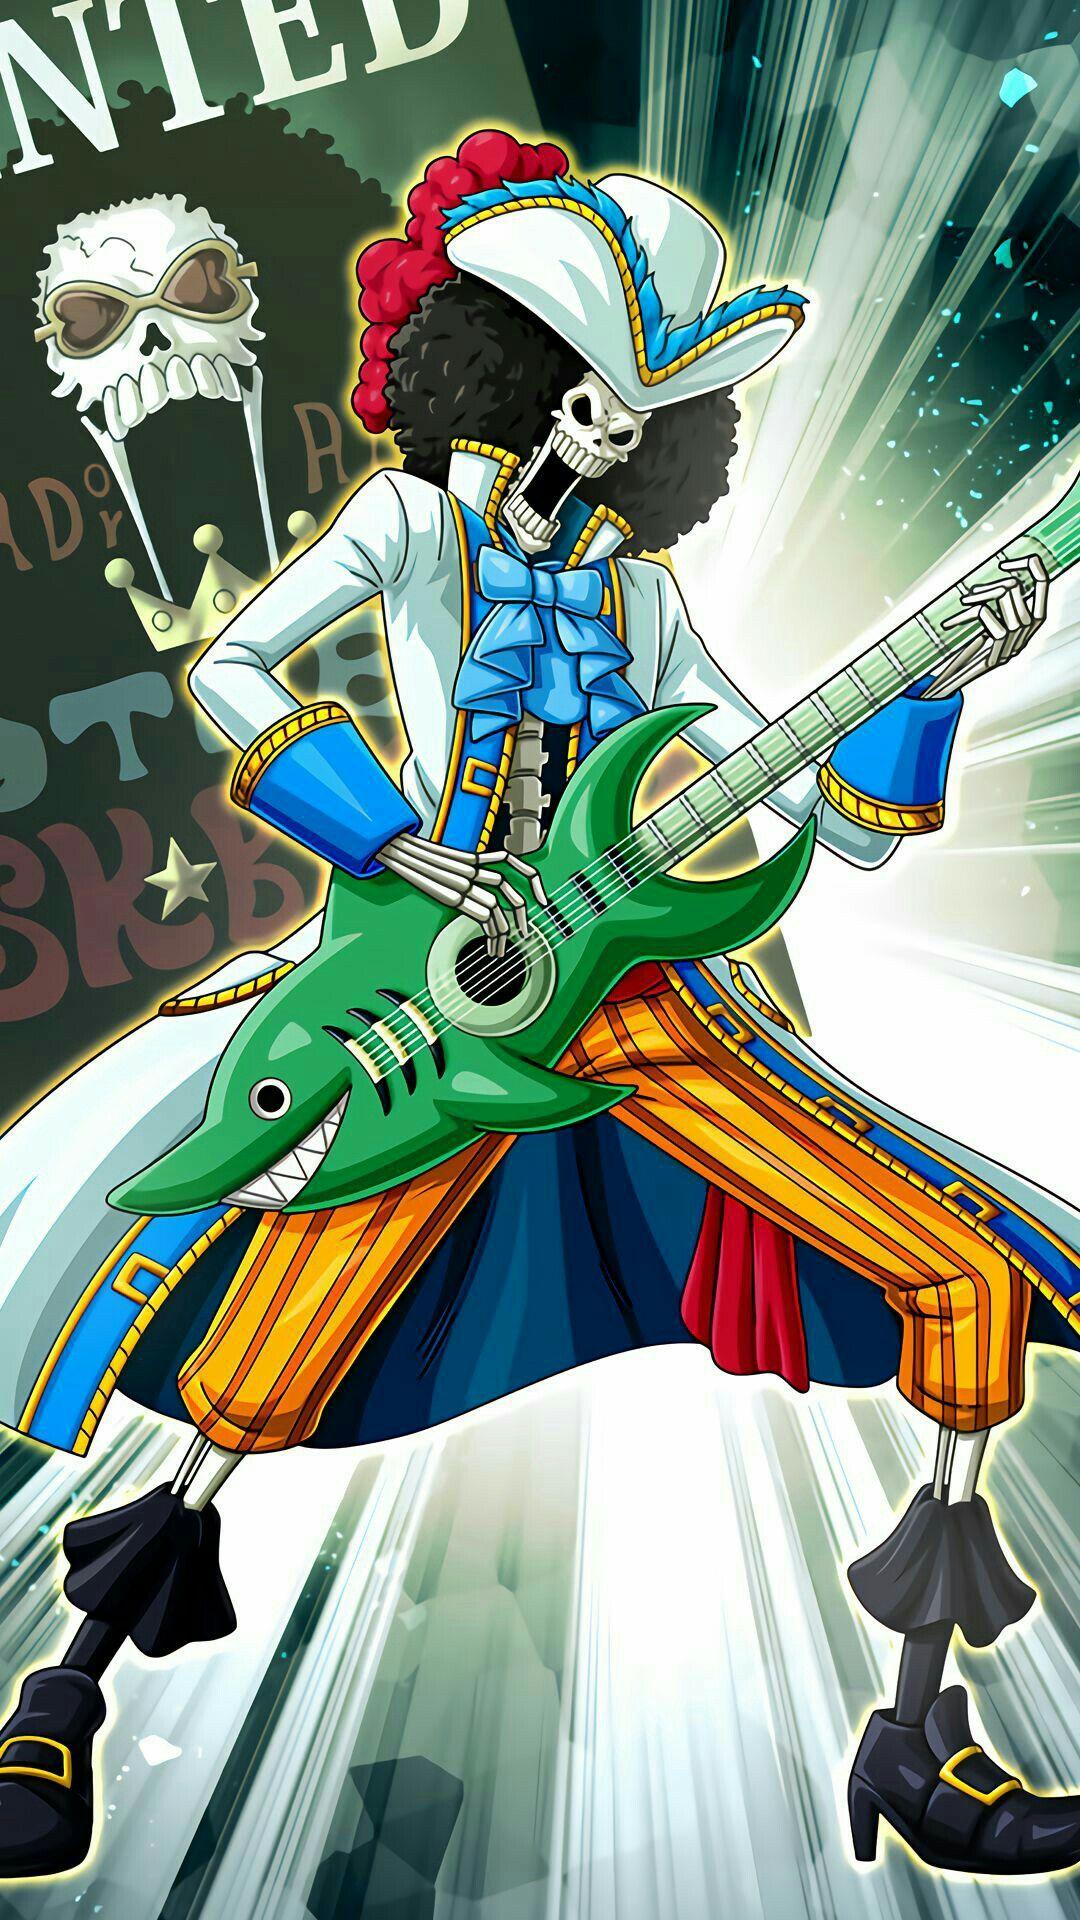 Brook One Piece One piece anime, Desenho de anime